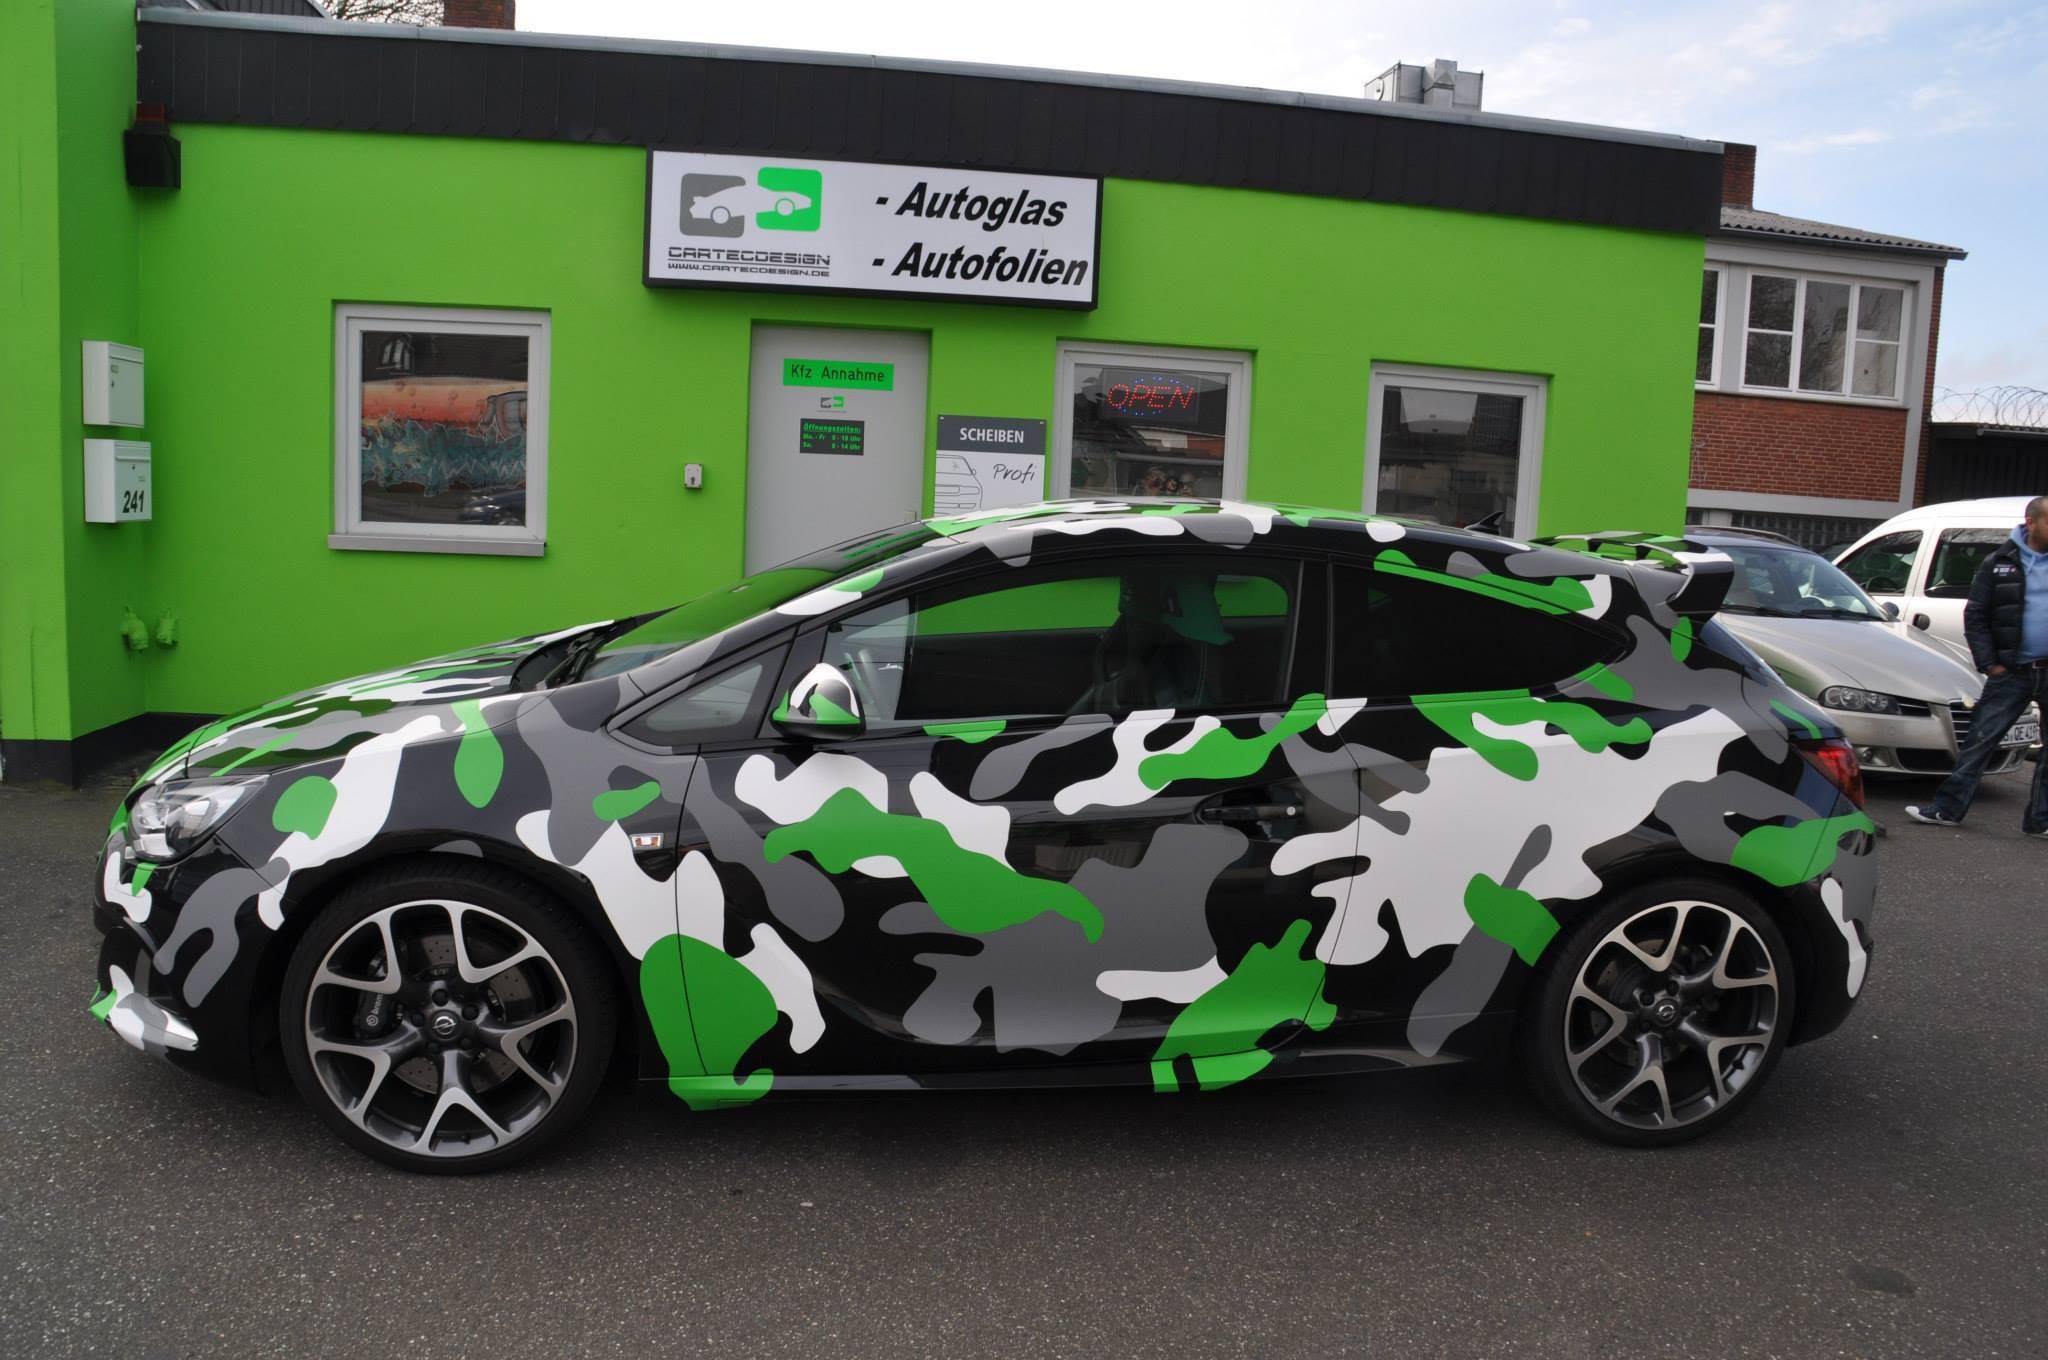 Auto Vinyl Wrap >> Opel Astra OPC in Camo Wrap Looks Tough - autoevolution